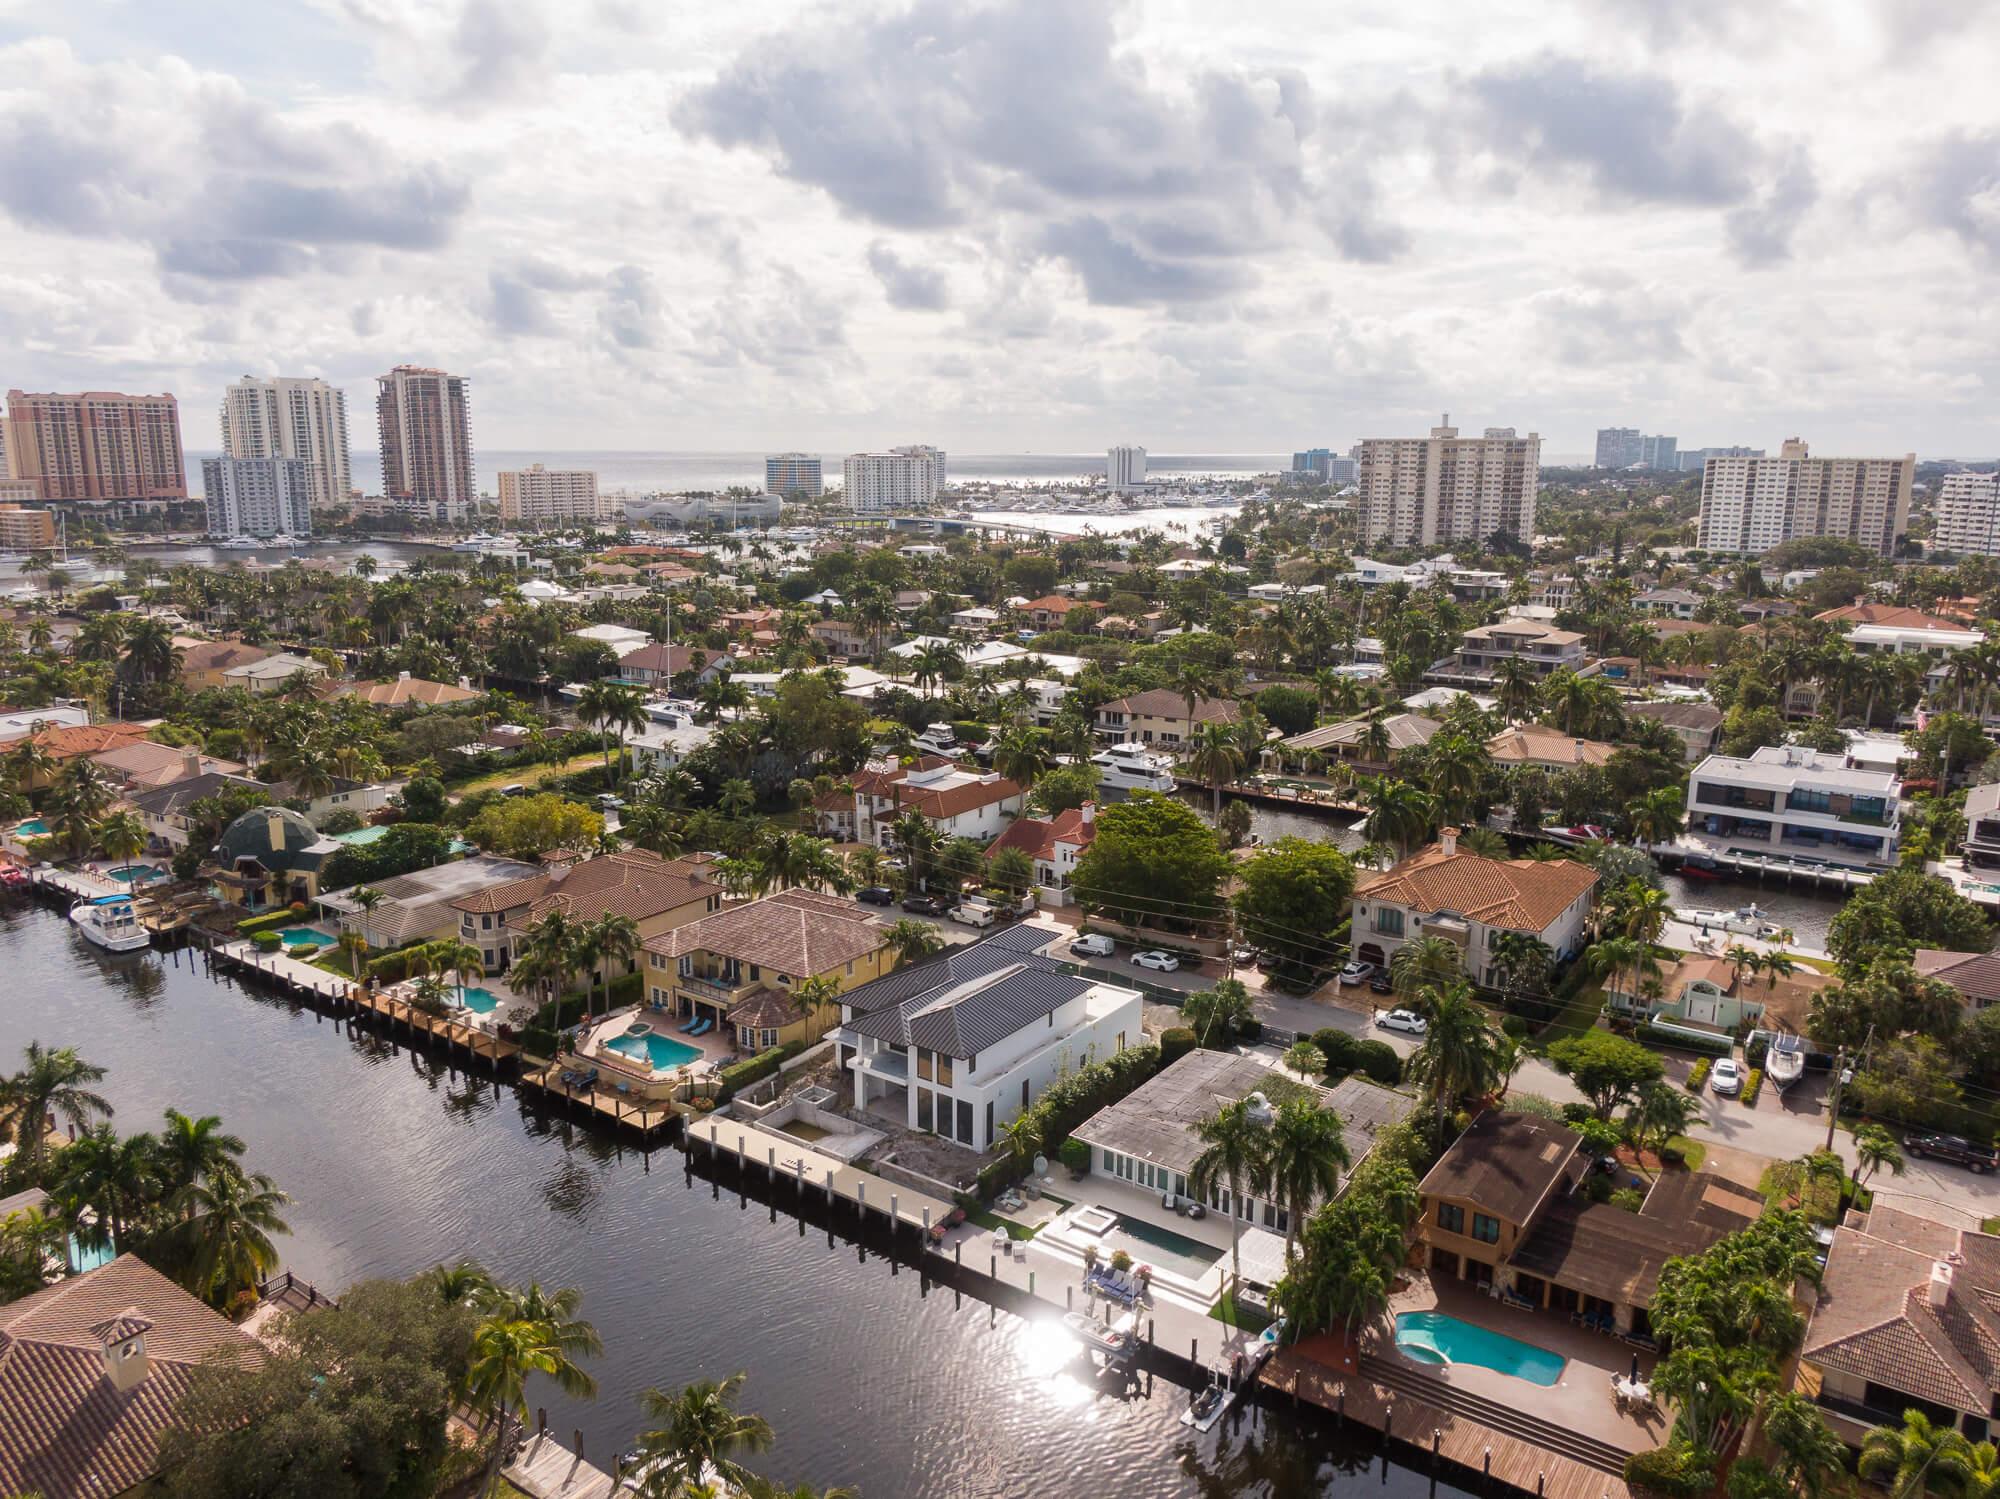 An Aerial View of an Oceanside Neighborhood